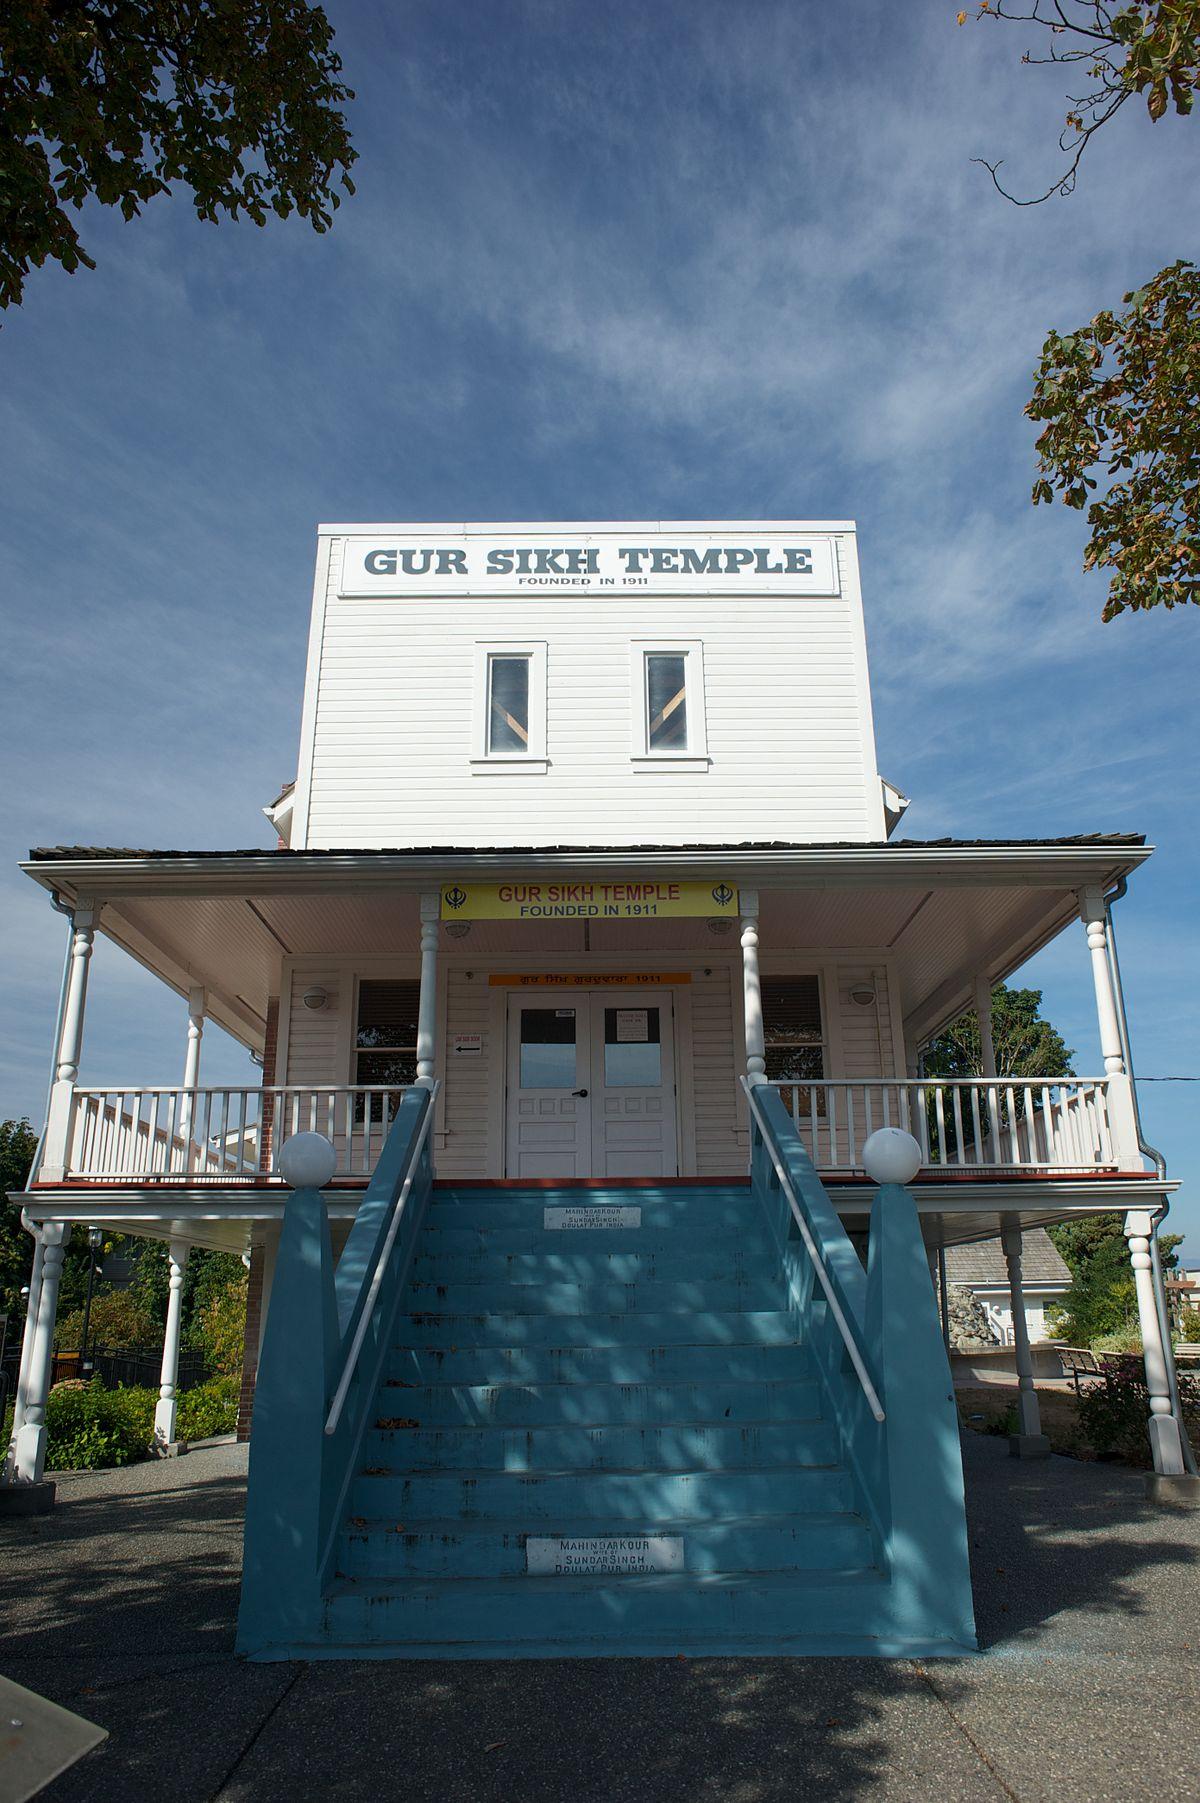 Gur Sikh Temple Wikipedia